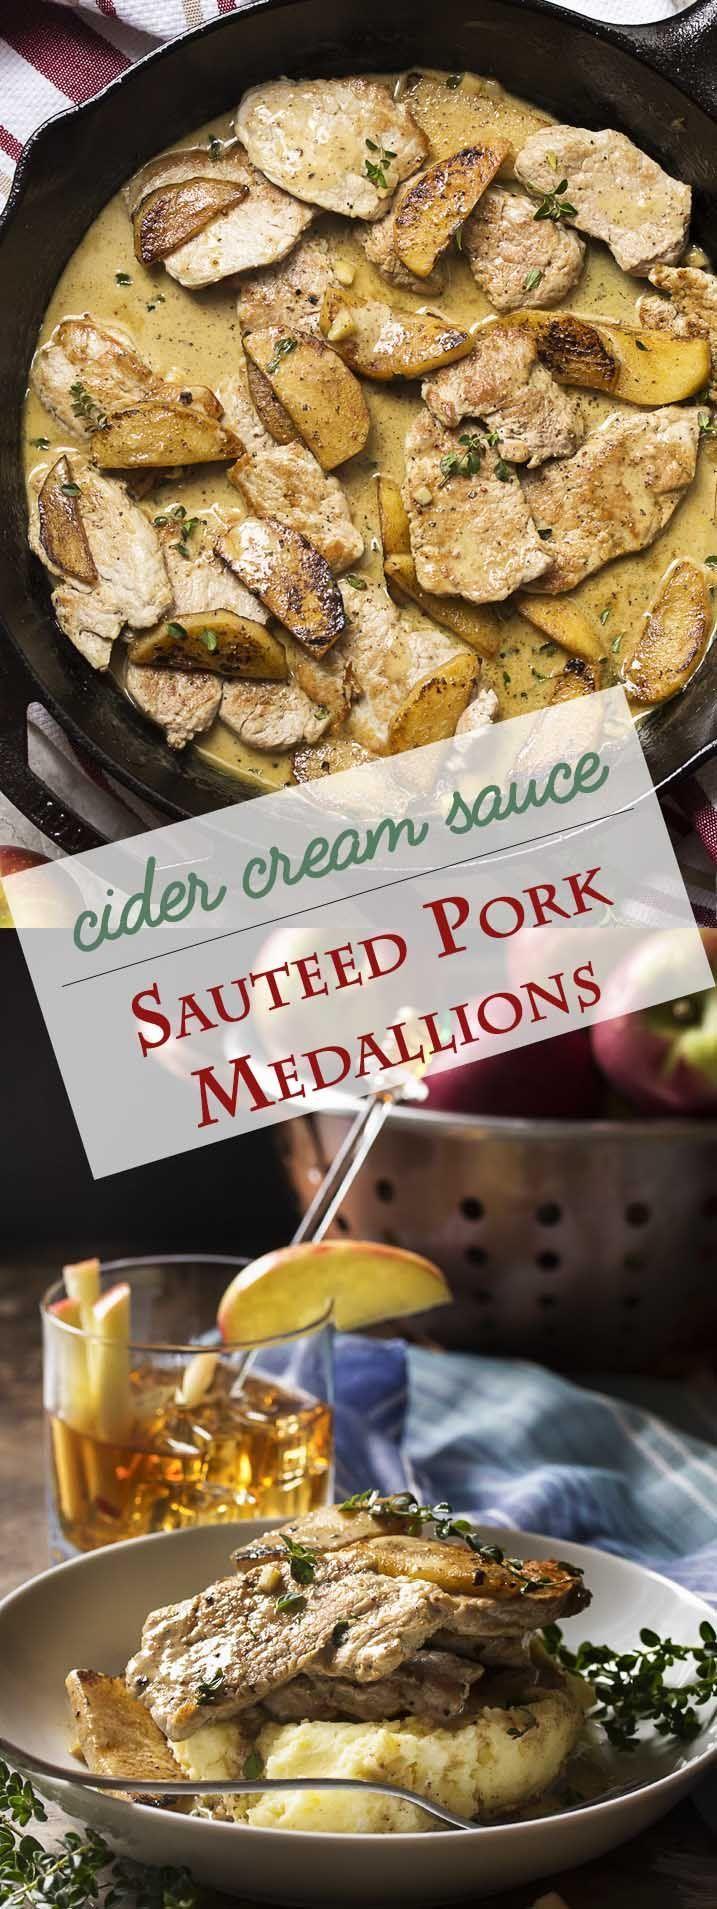 Sauteed Pork Tenderloin Medallions With A Cider Cream